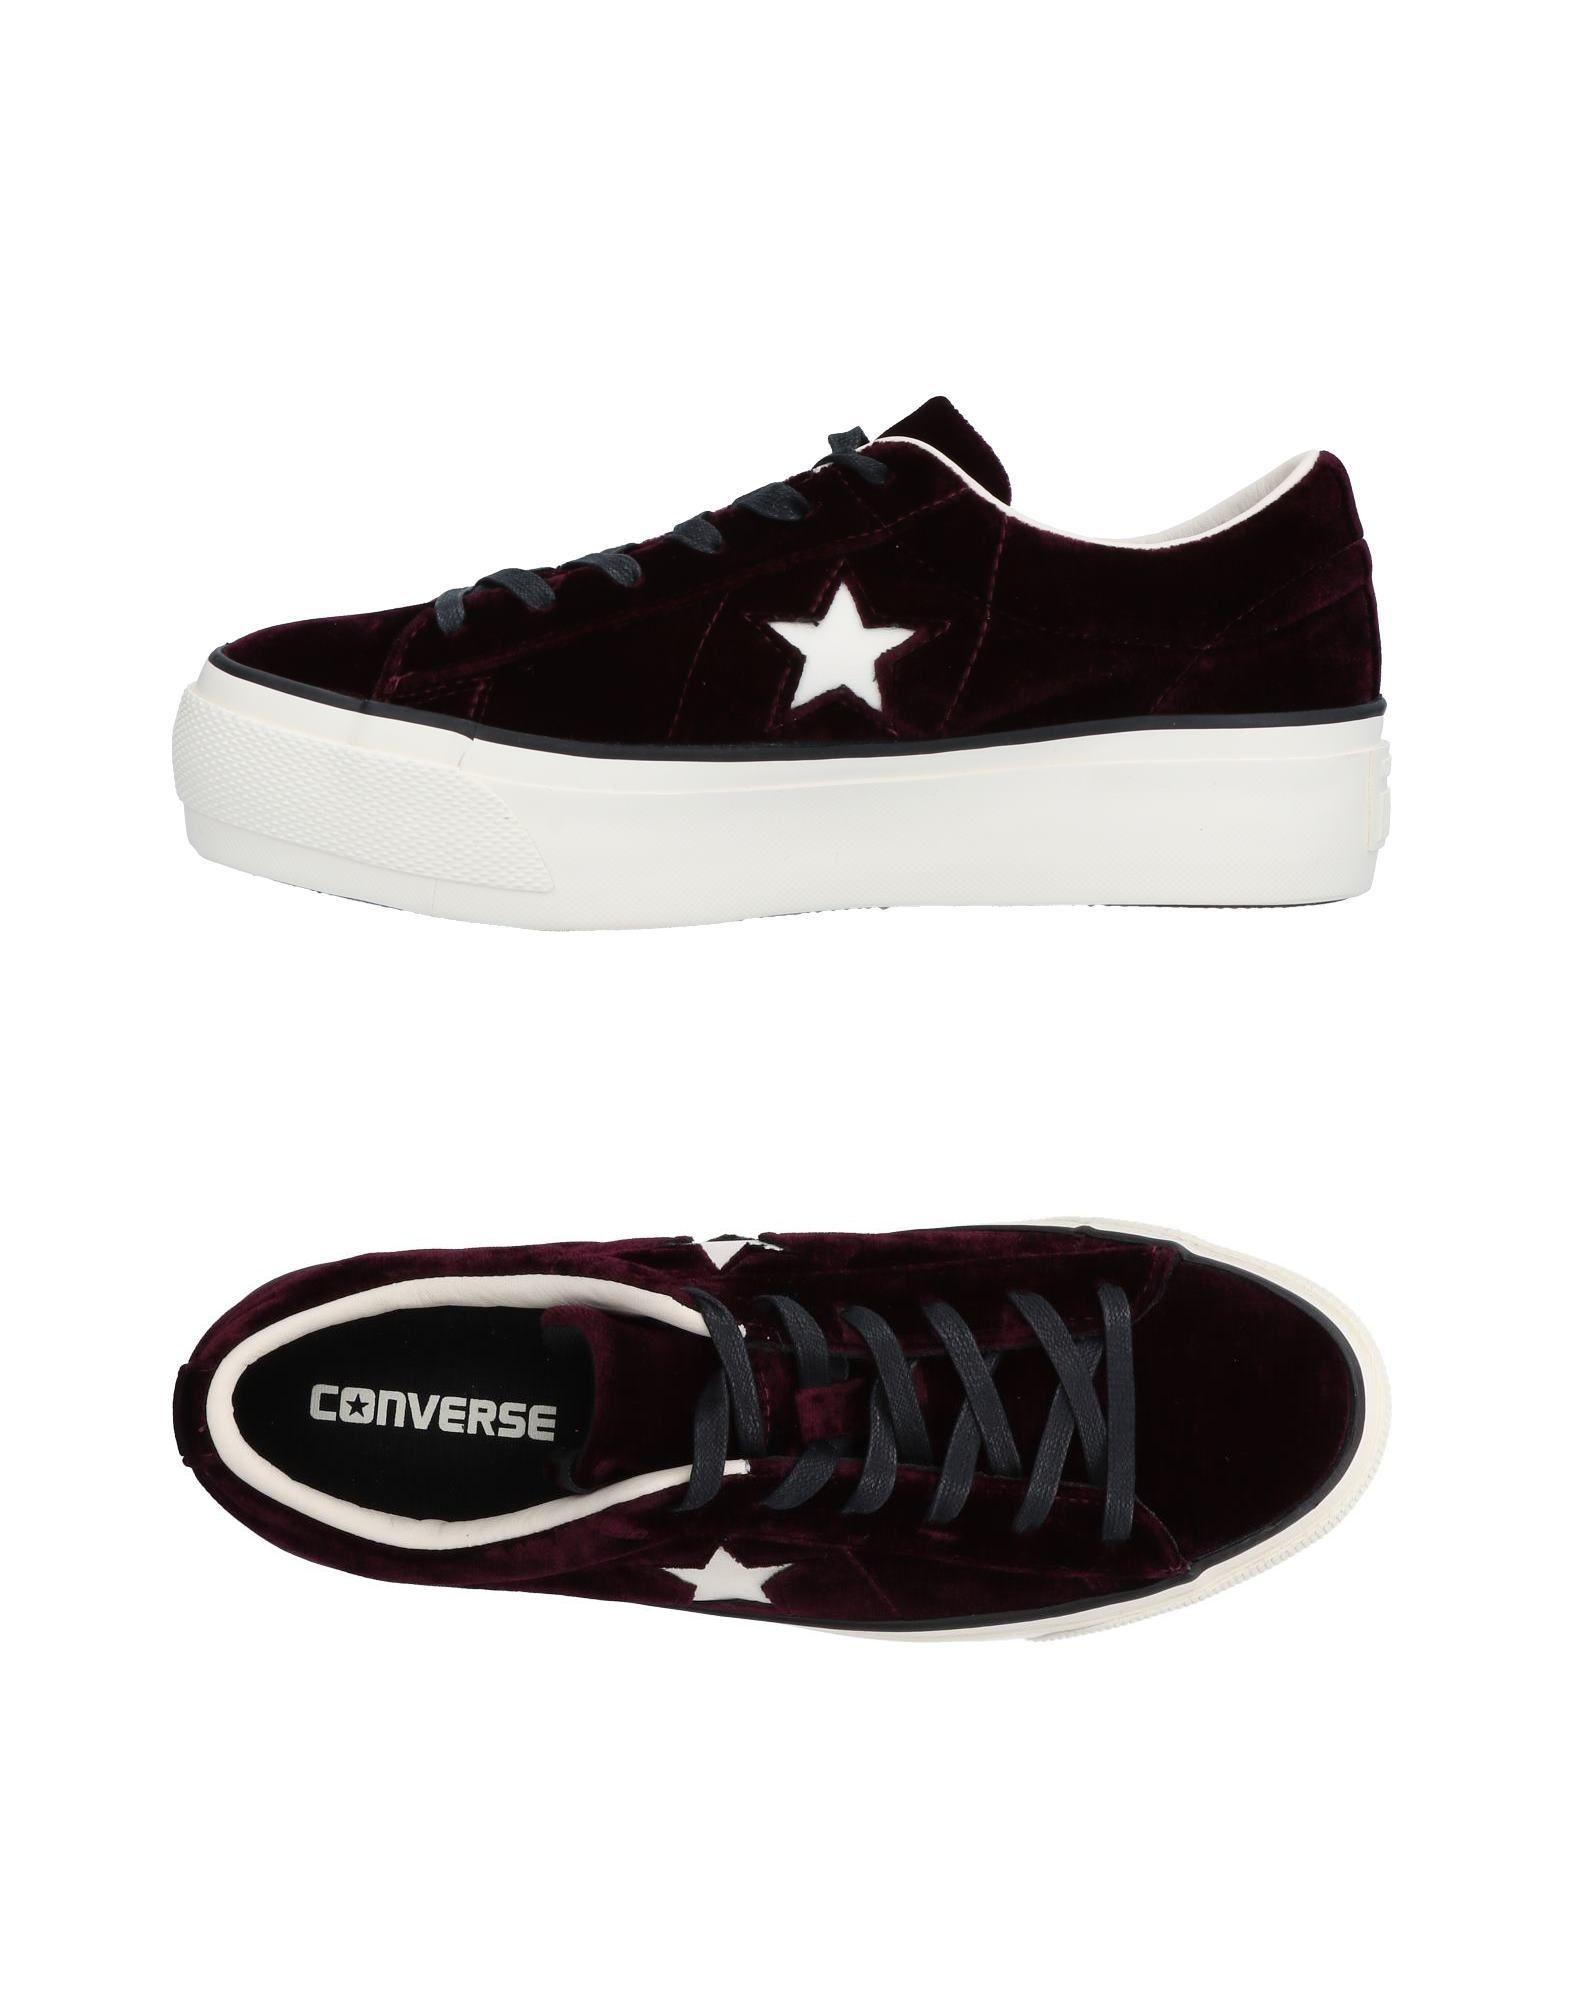 Converse Sneakers Damen  11493582IU Gute Qualität beliebte Schuhe